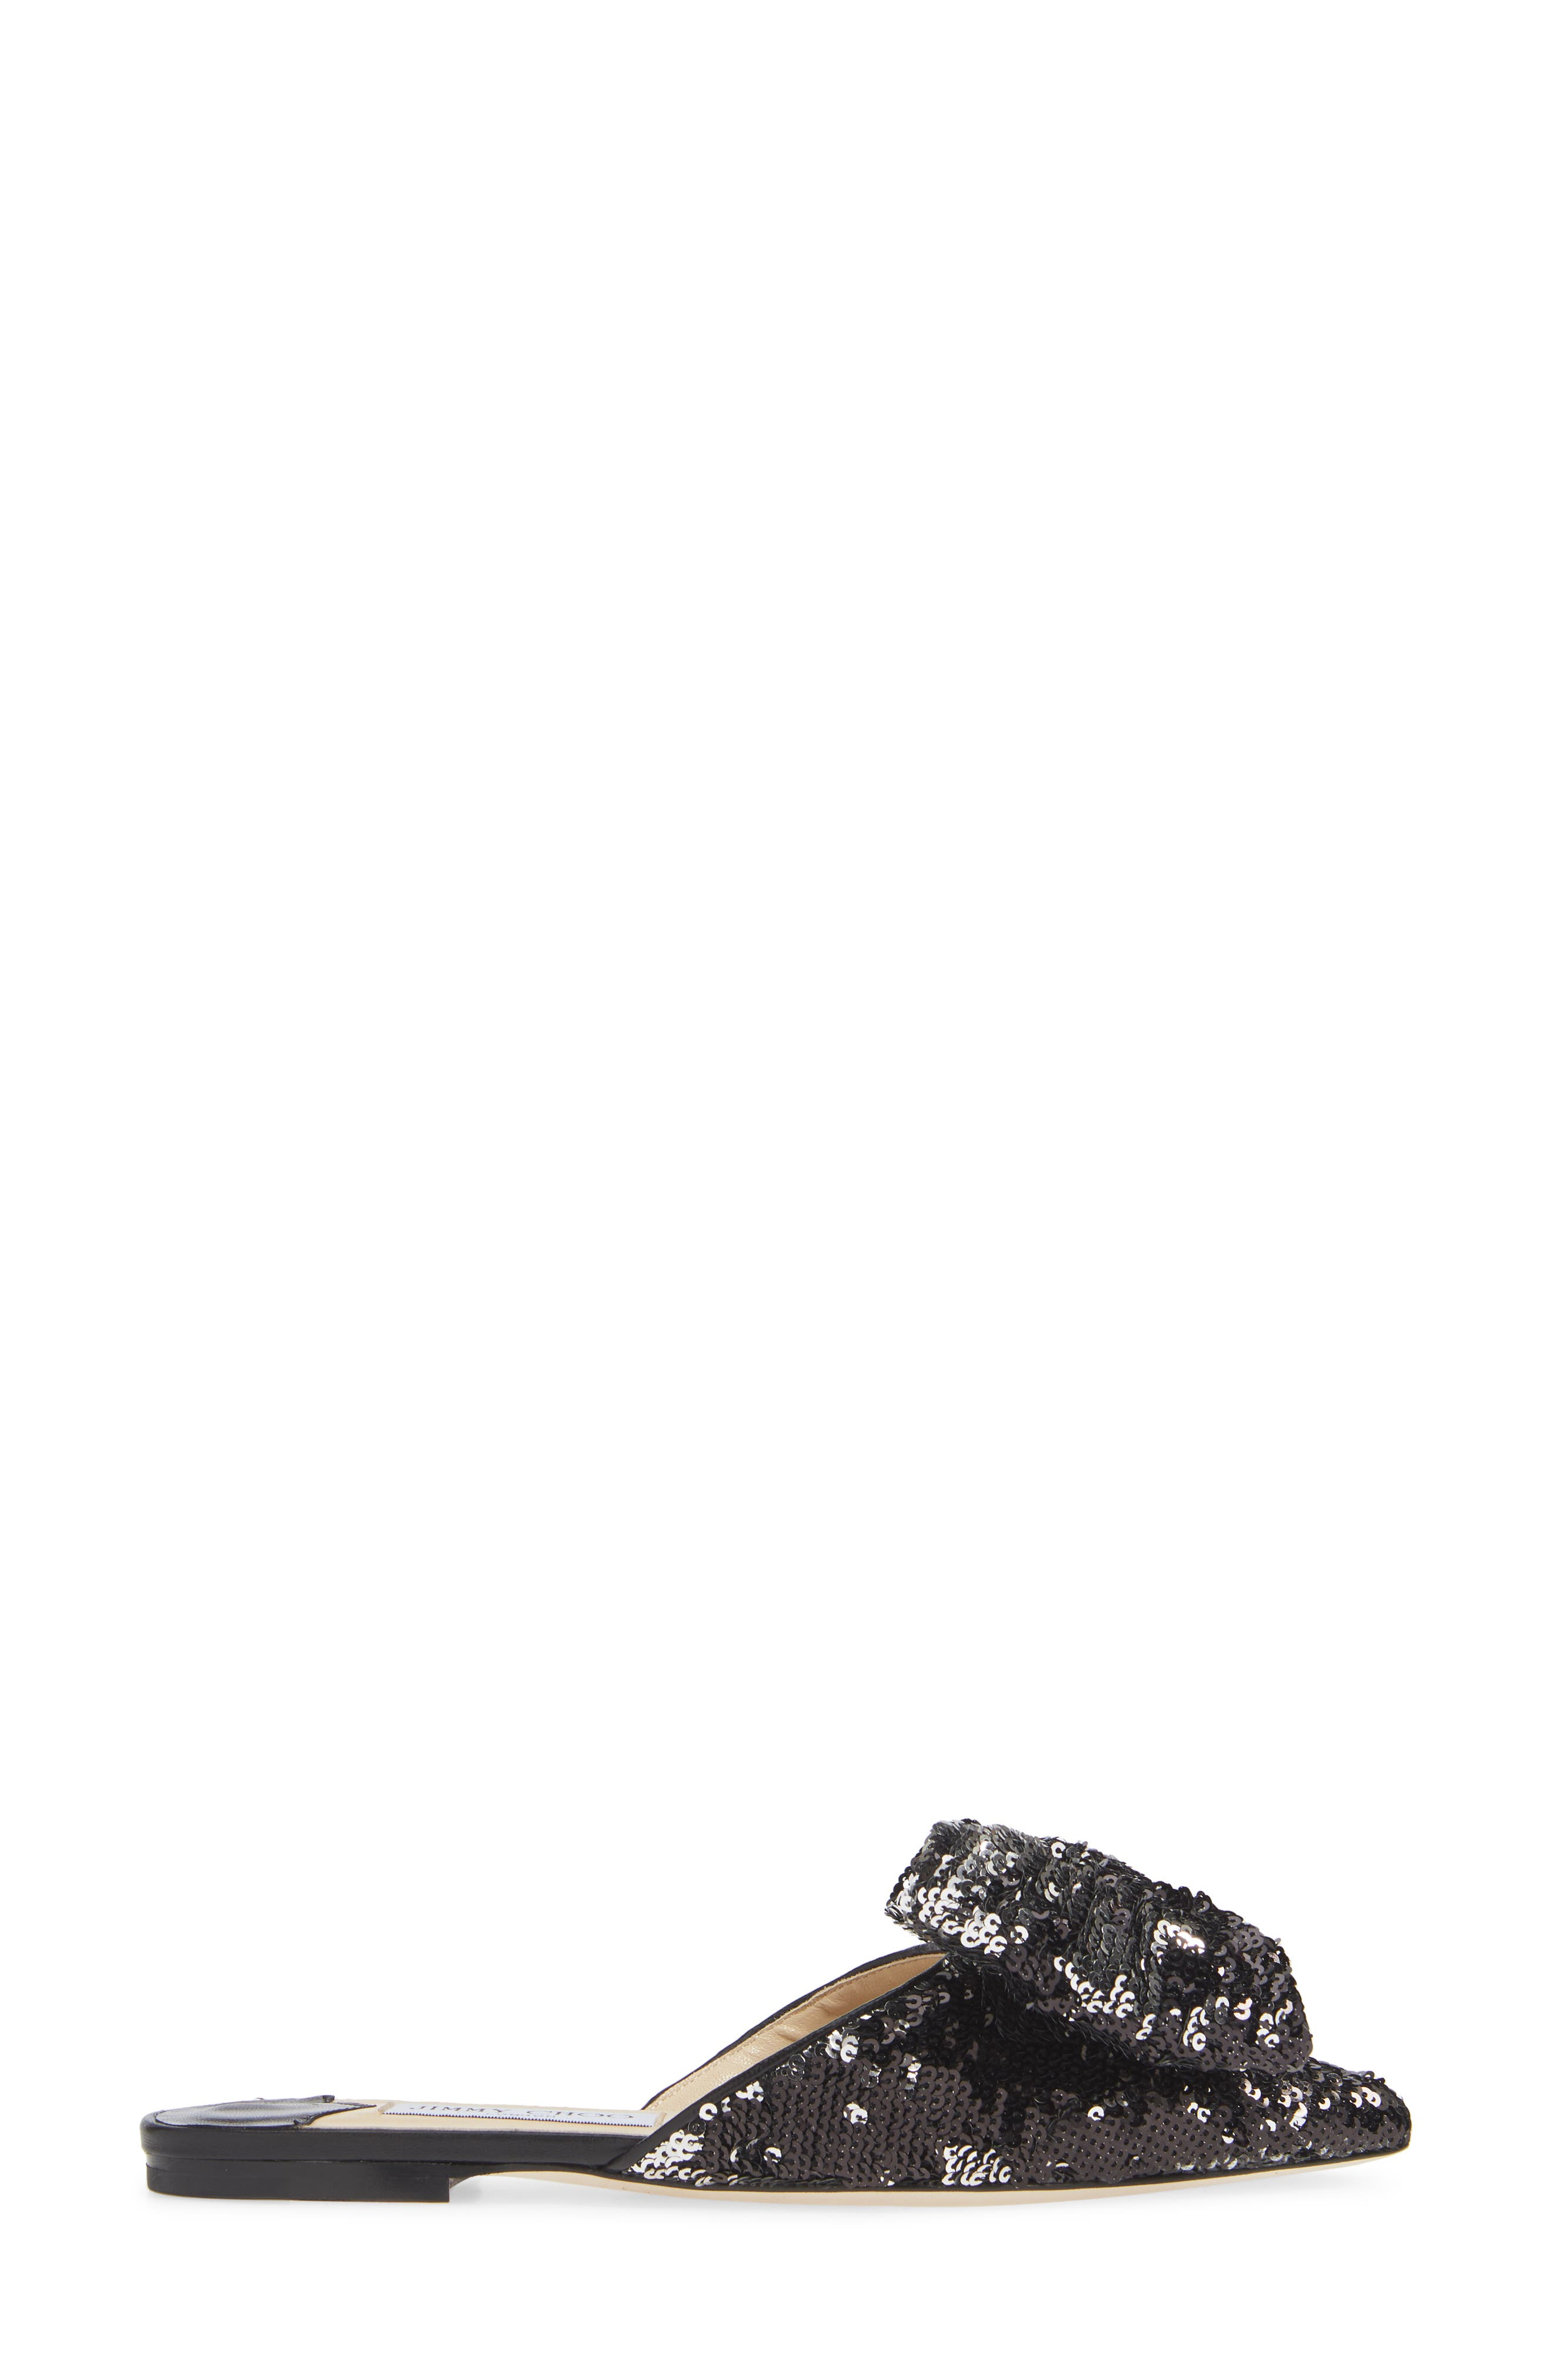 Georgia Sequin Bow Mule,                             Alternate thumbnail 3, color,                             BLACK/ SILVER